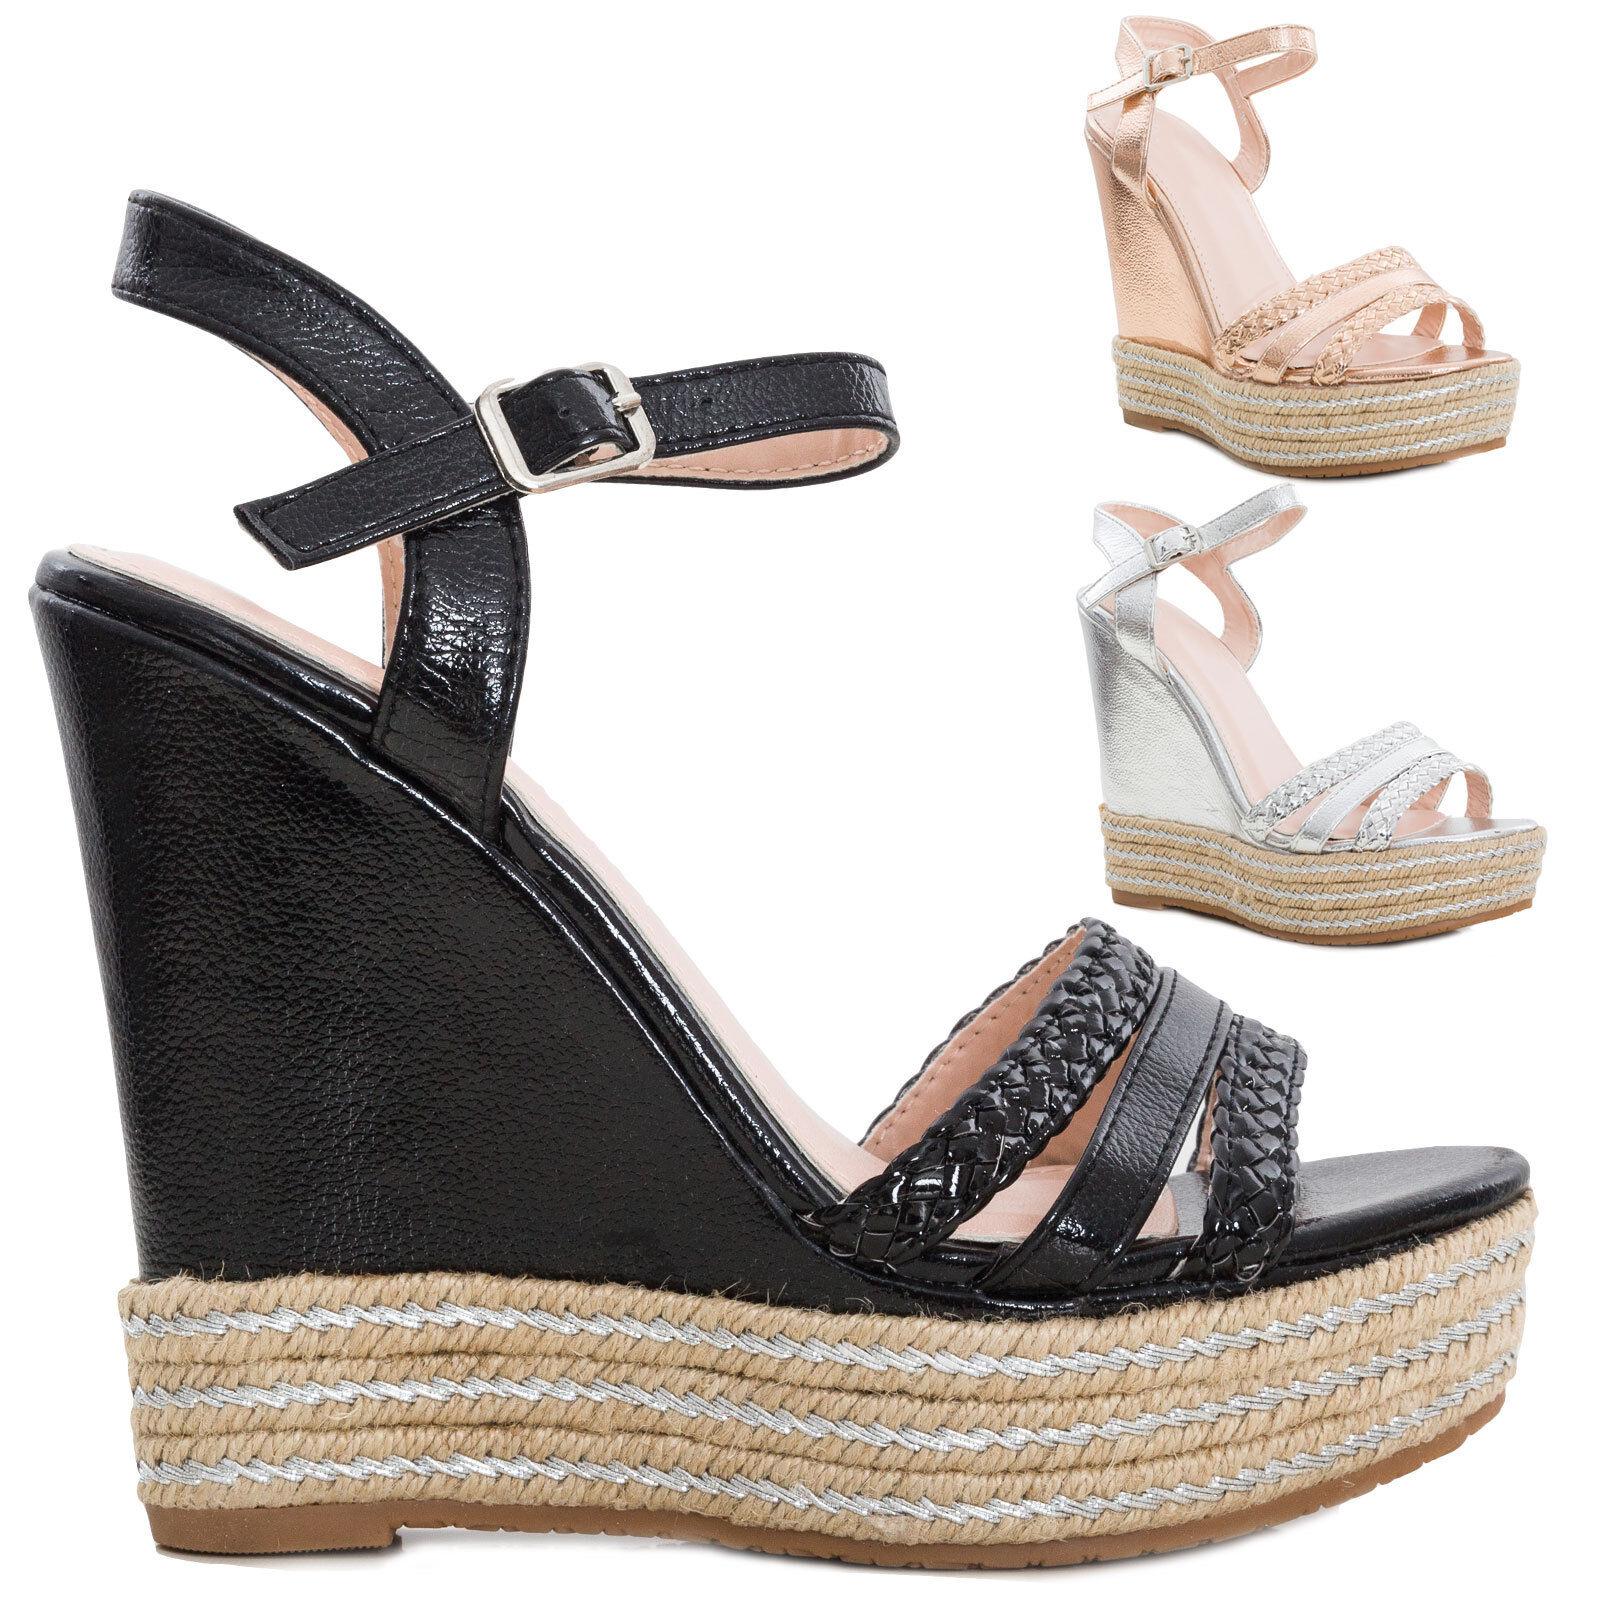 Women's shoes sandals wedges eco-leather effect metallized heels big KA-50